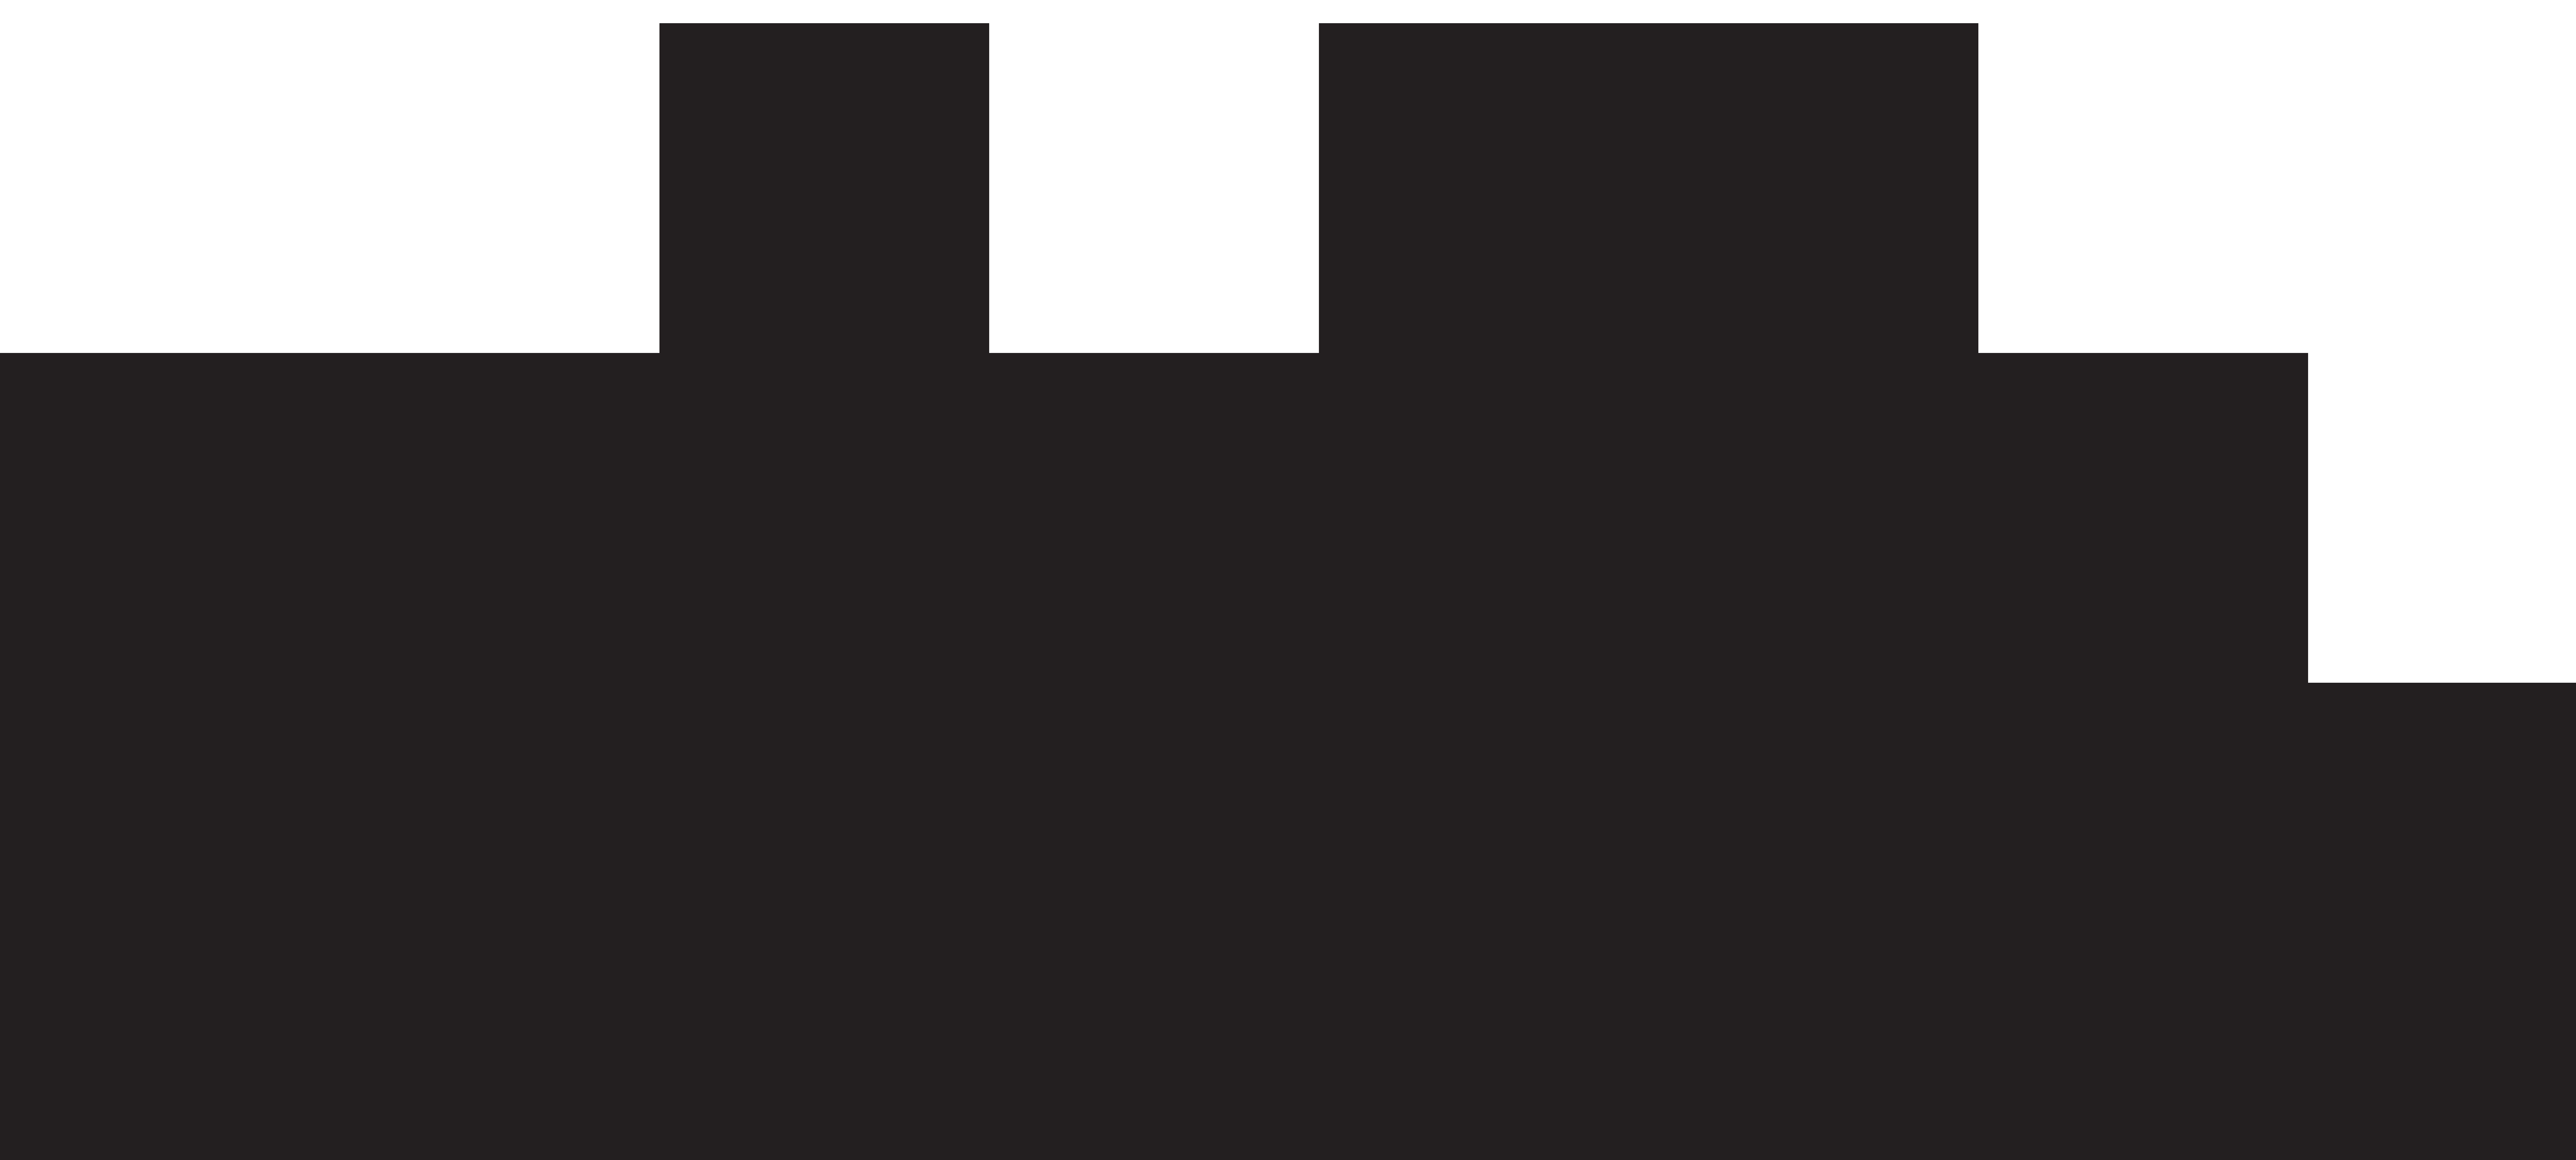 Big City Silhouette PNG Clip Art.